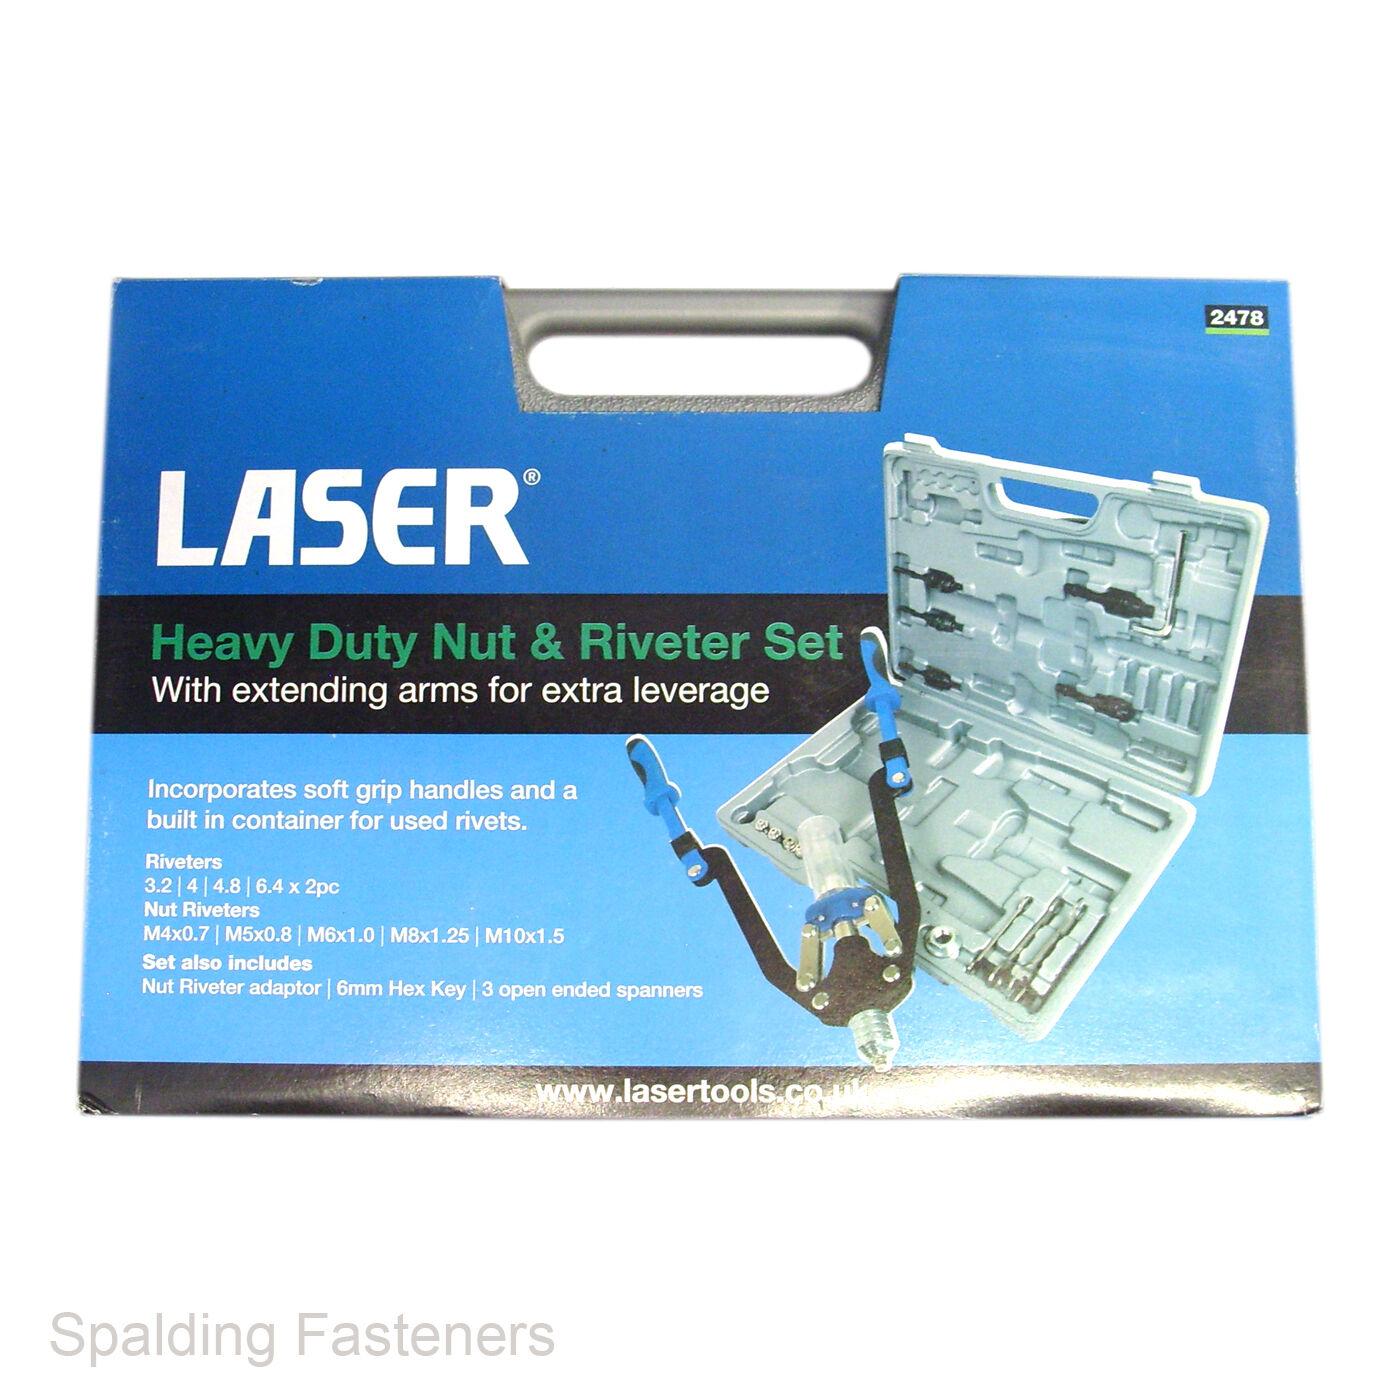 Laser Heavy Duty Nut & Riveter Set - 3.2 To 6.4mm Rivets & M4 To M10 Nut Rivets